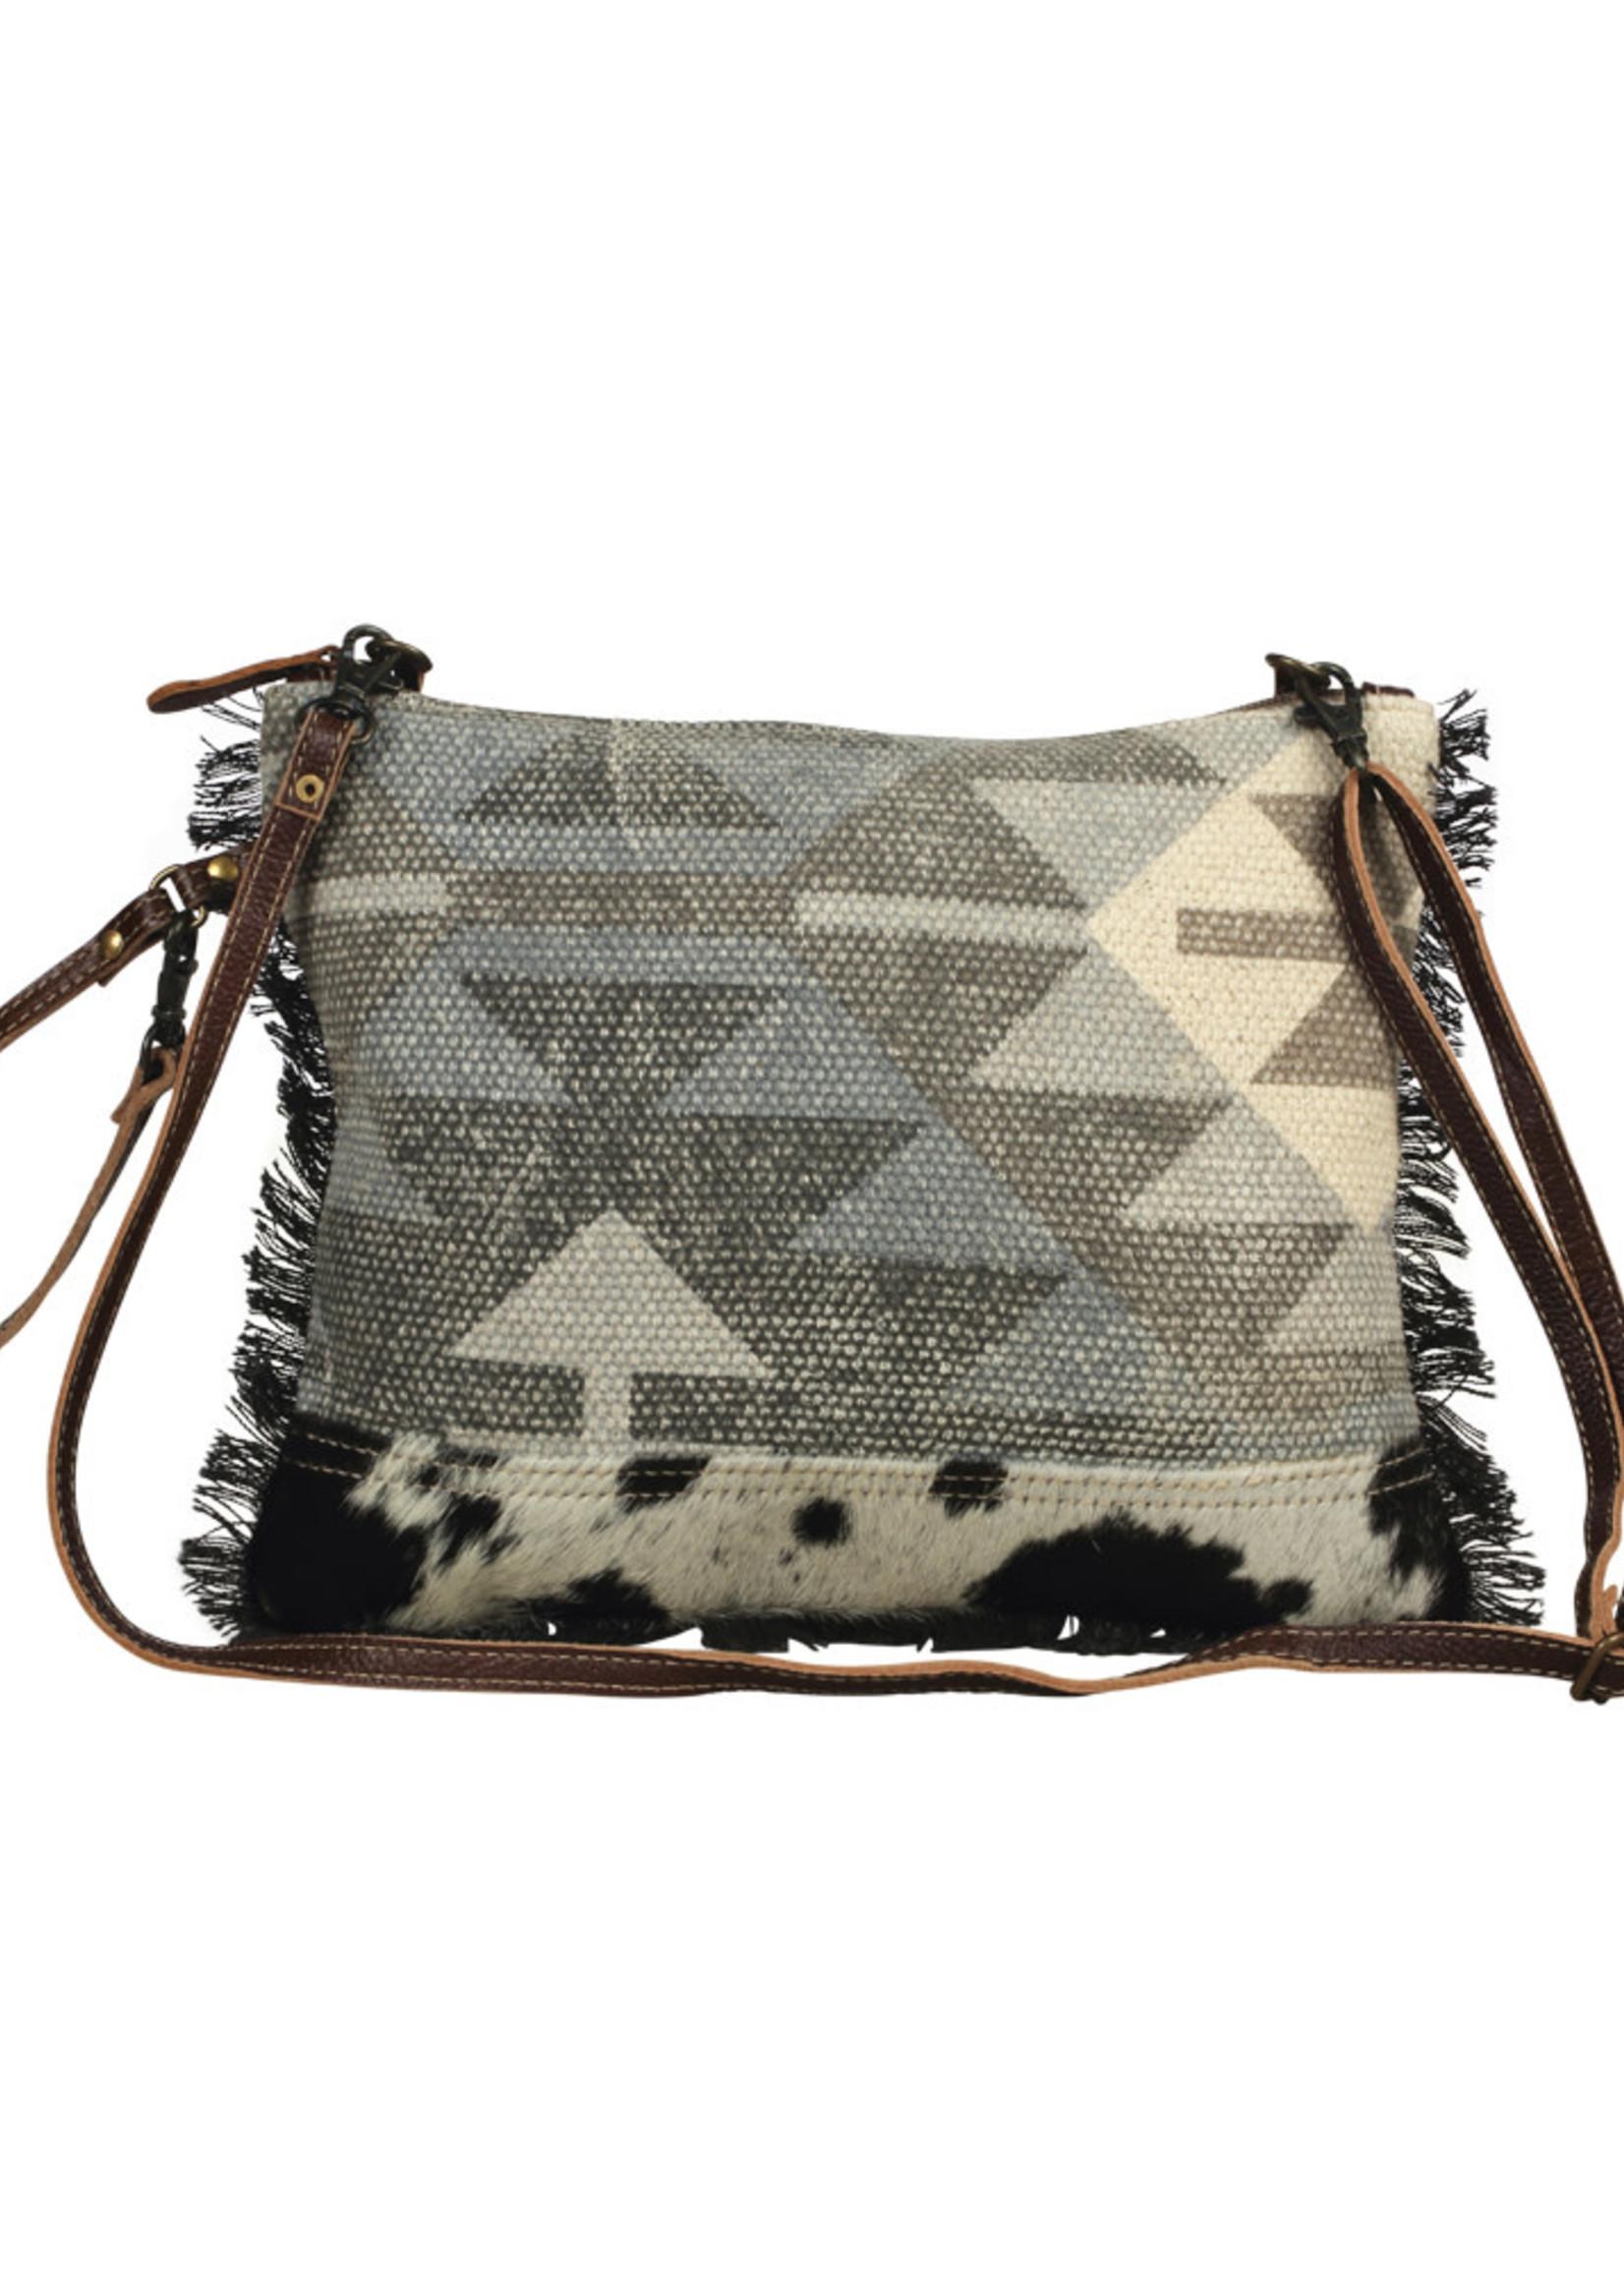 Myra Bags S-2065 Gritty Small & Crossbody Bag